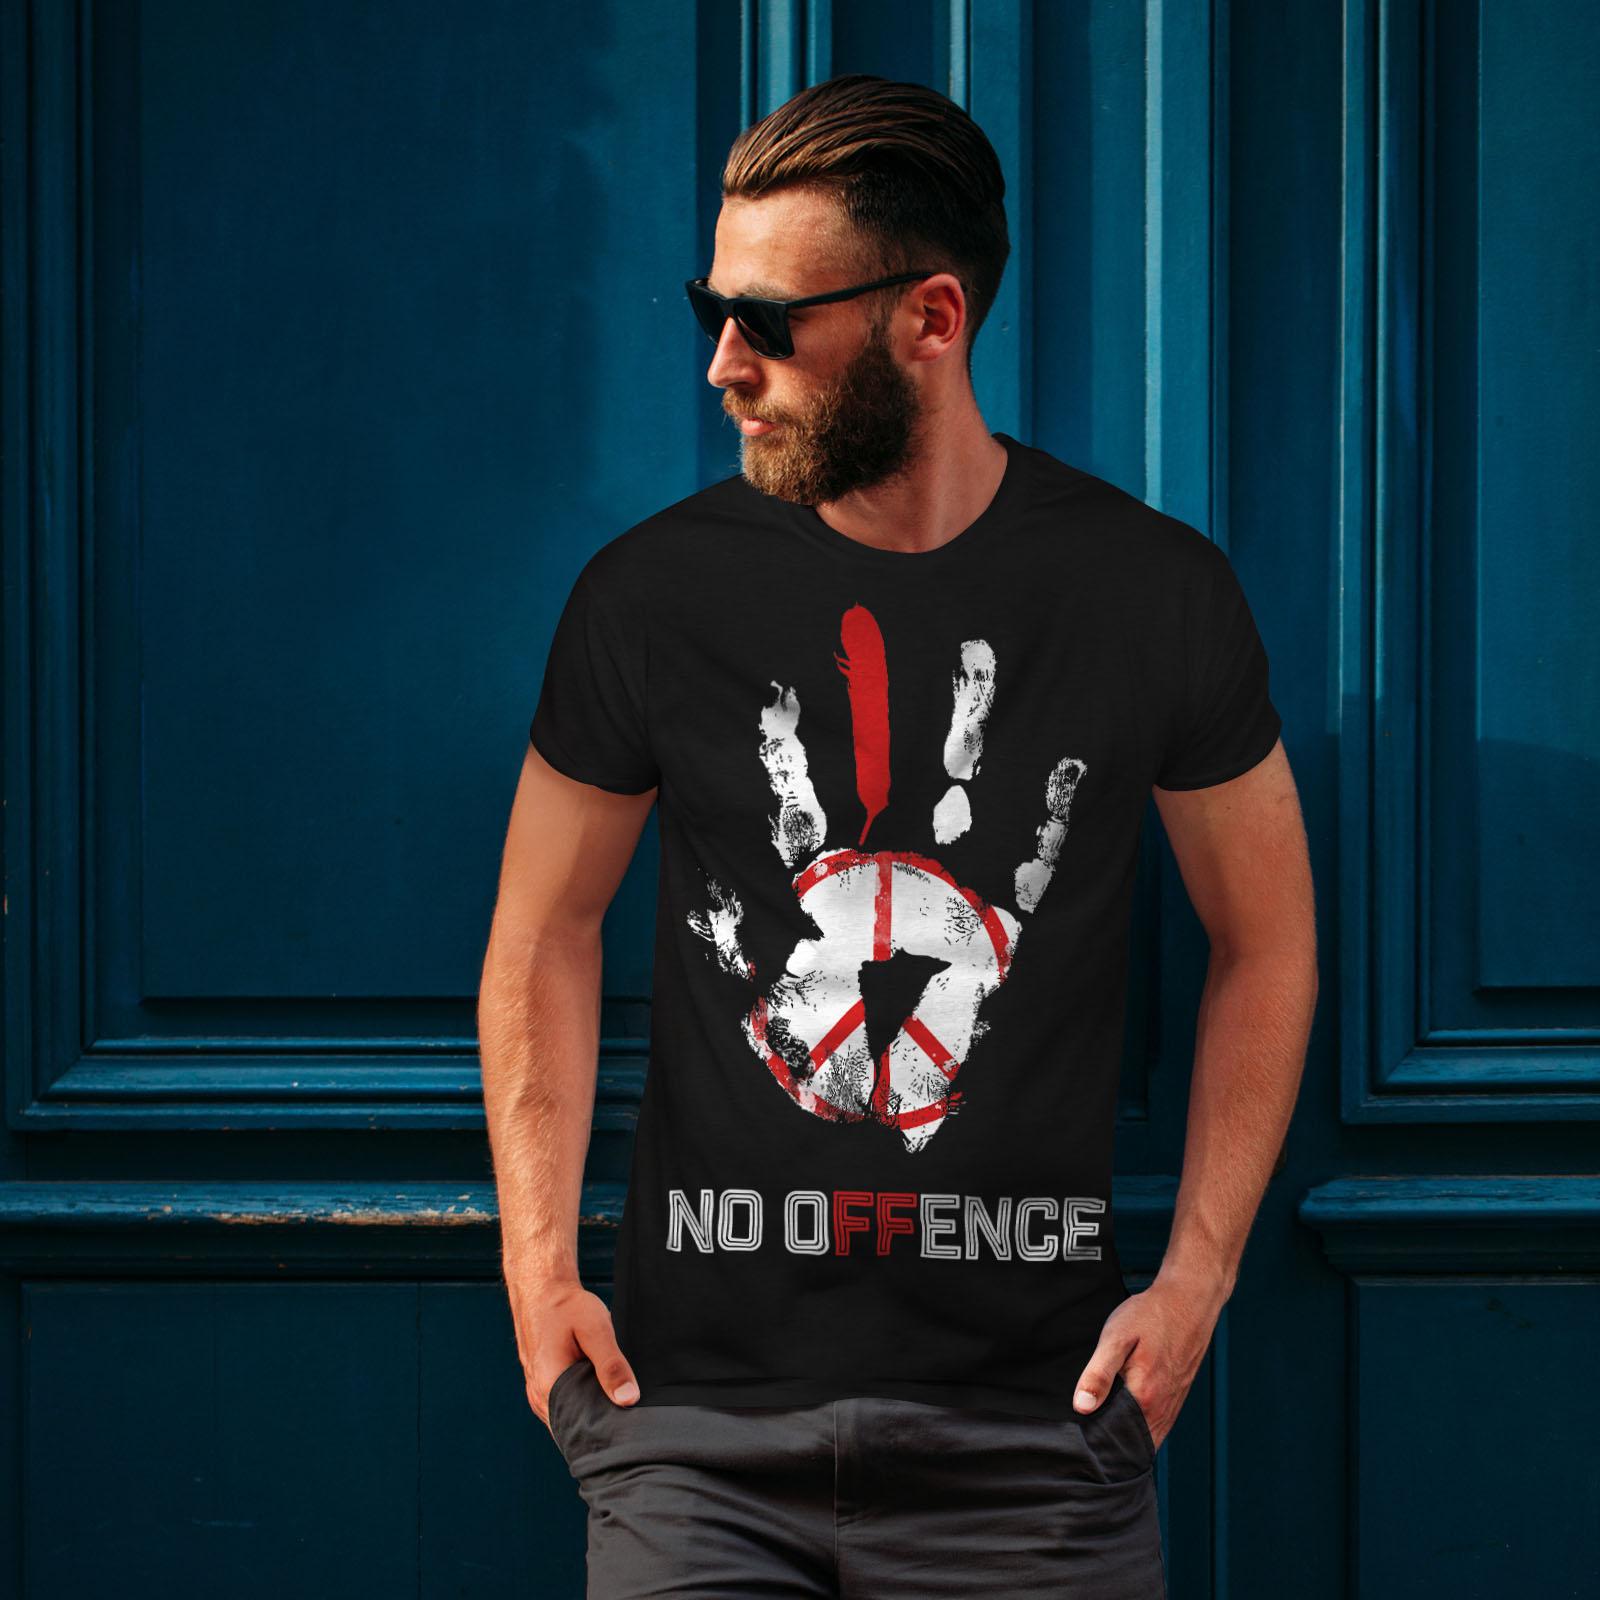 Wellcoda No Offence Peace Slogan Mens T-shirt World Graphic Design Printed Tee